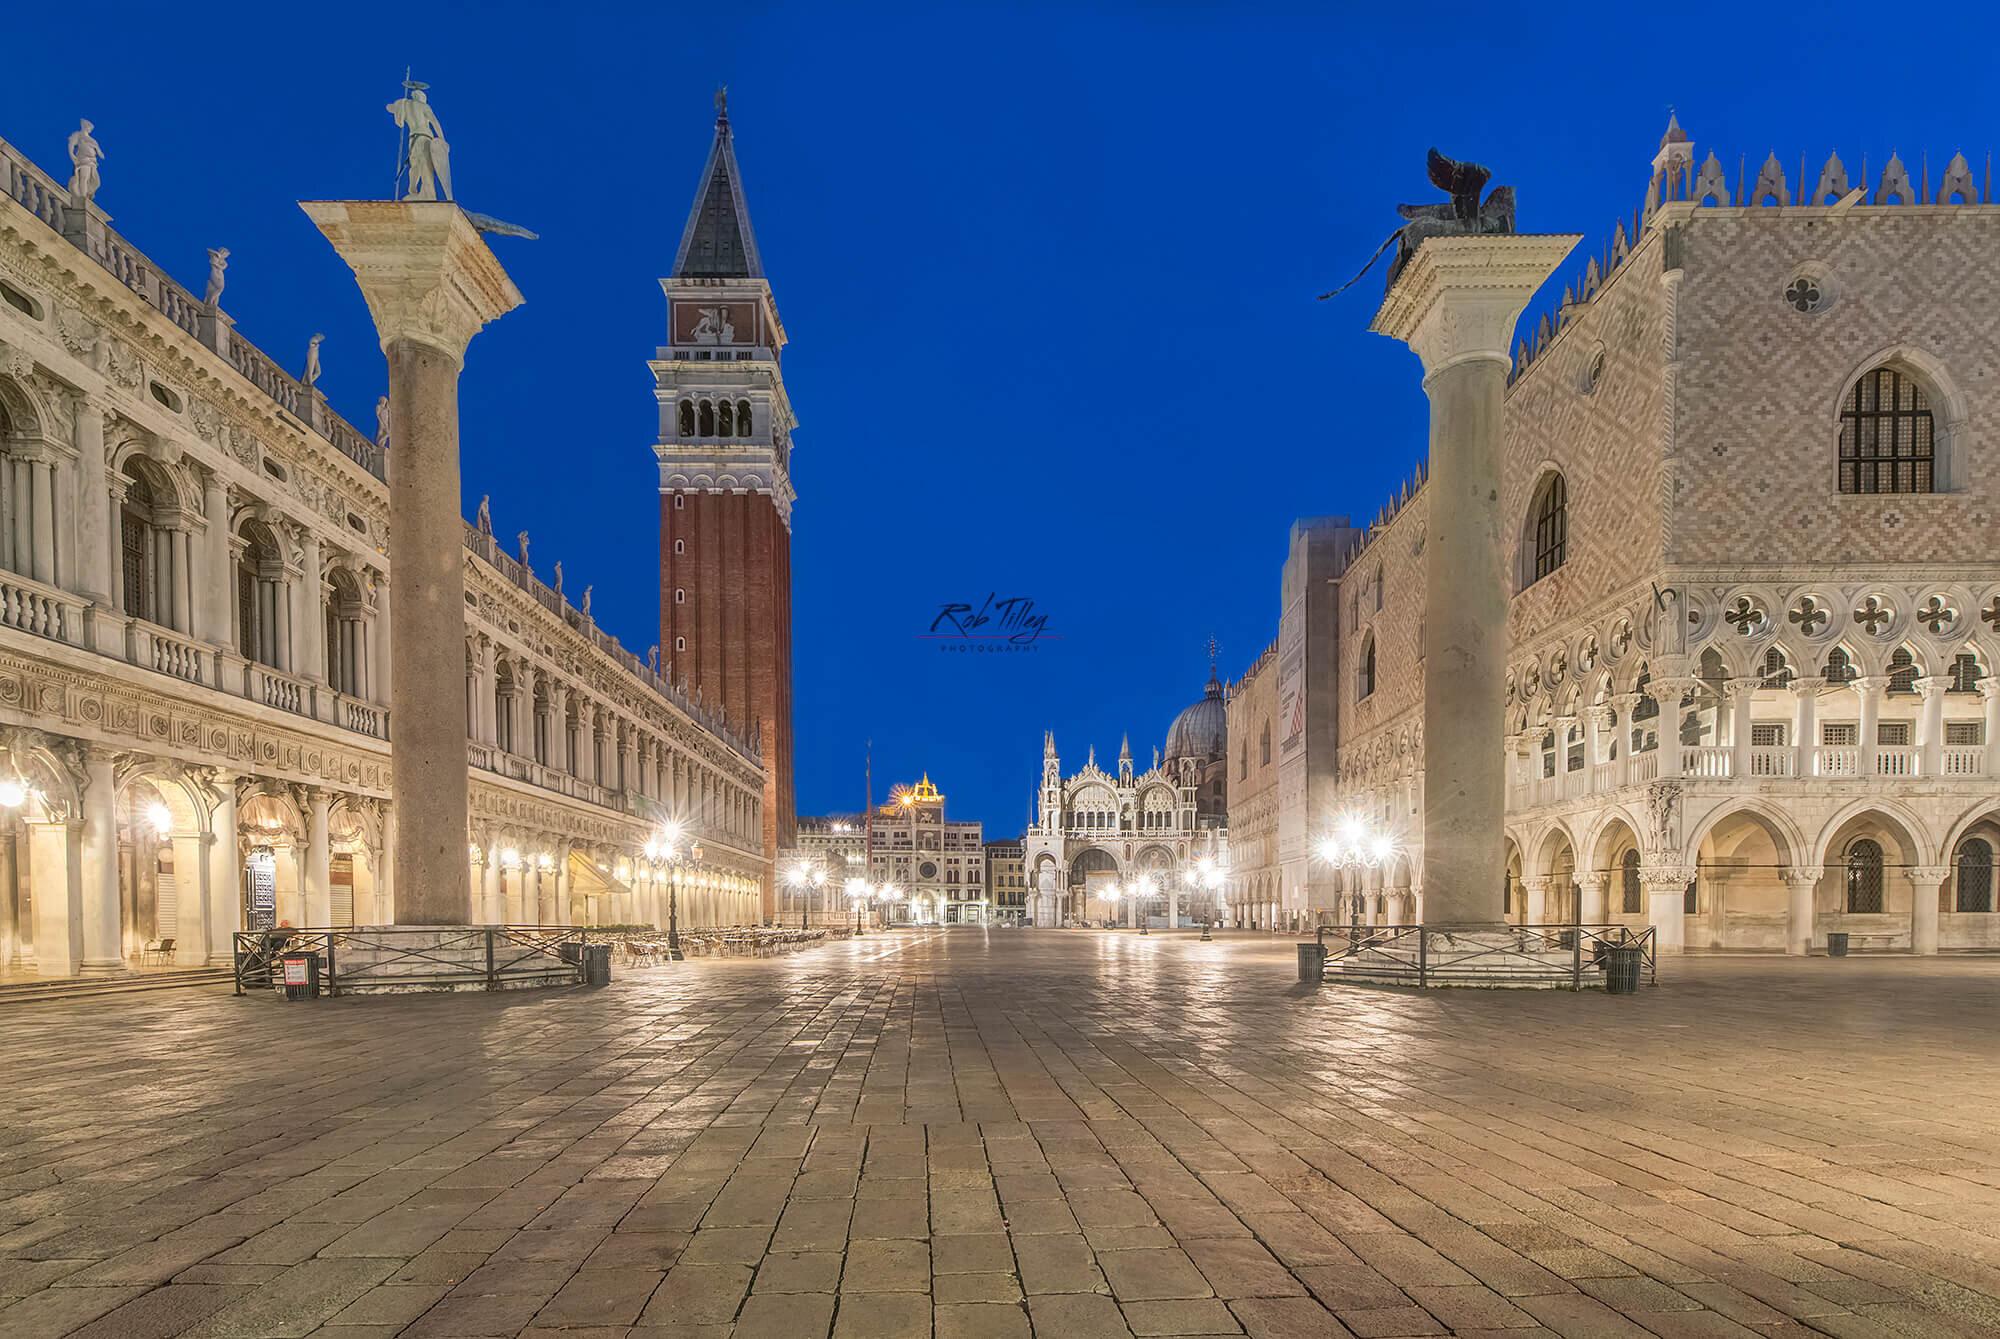 San Marco Piazza Dawn.jpg